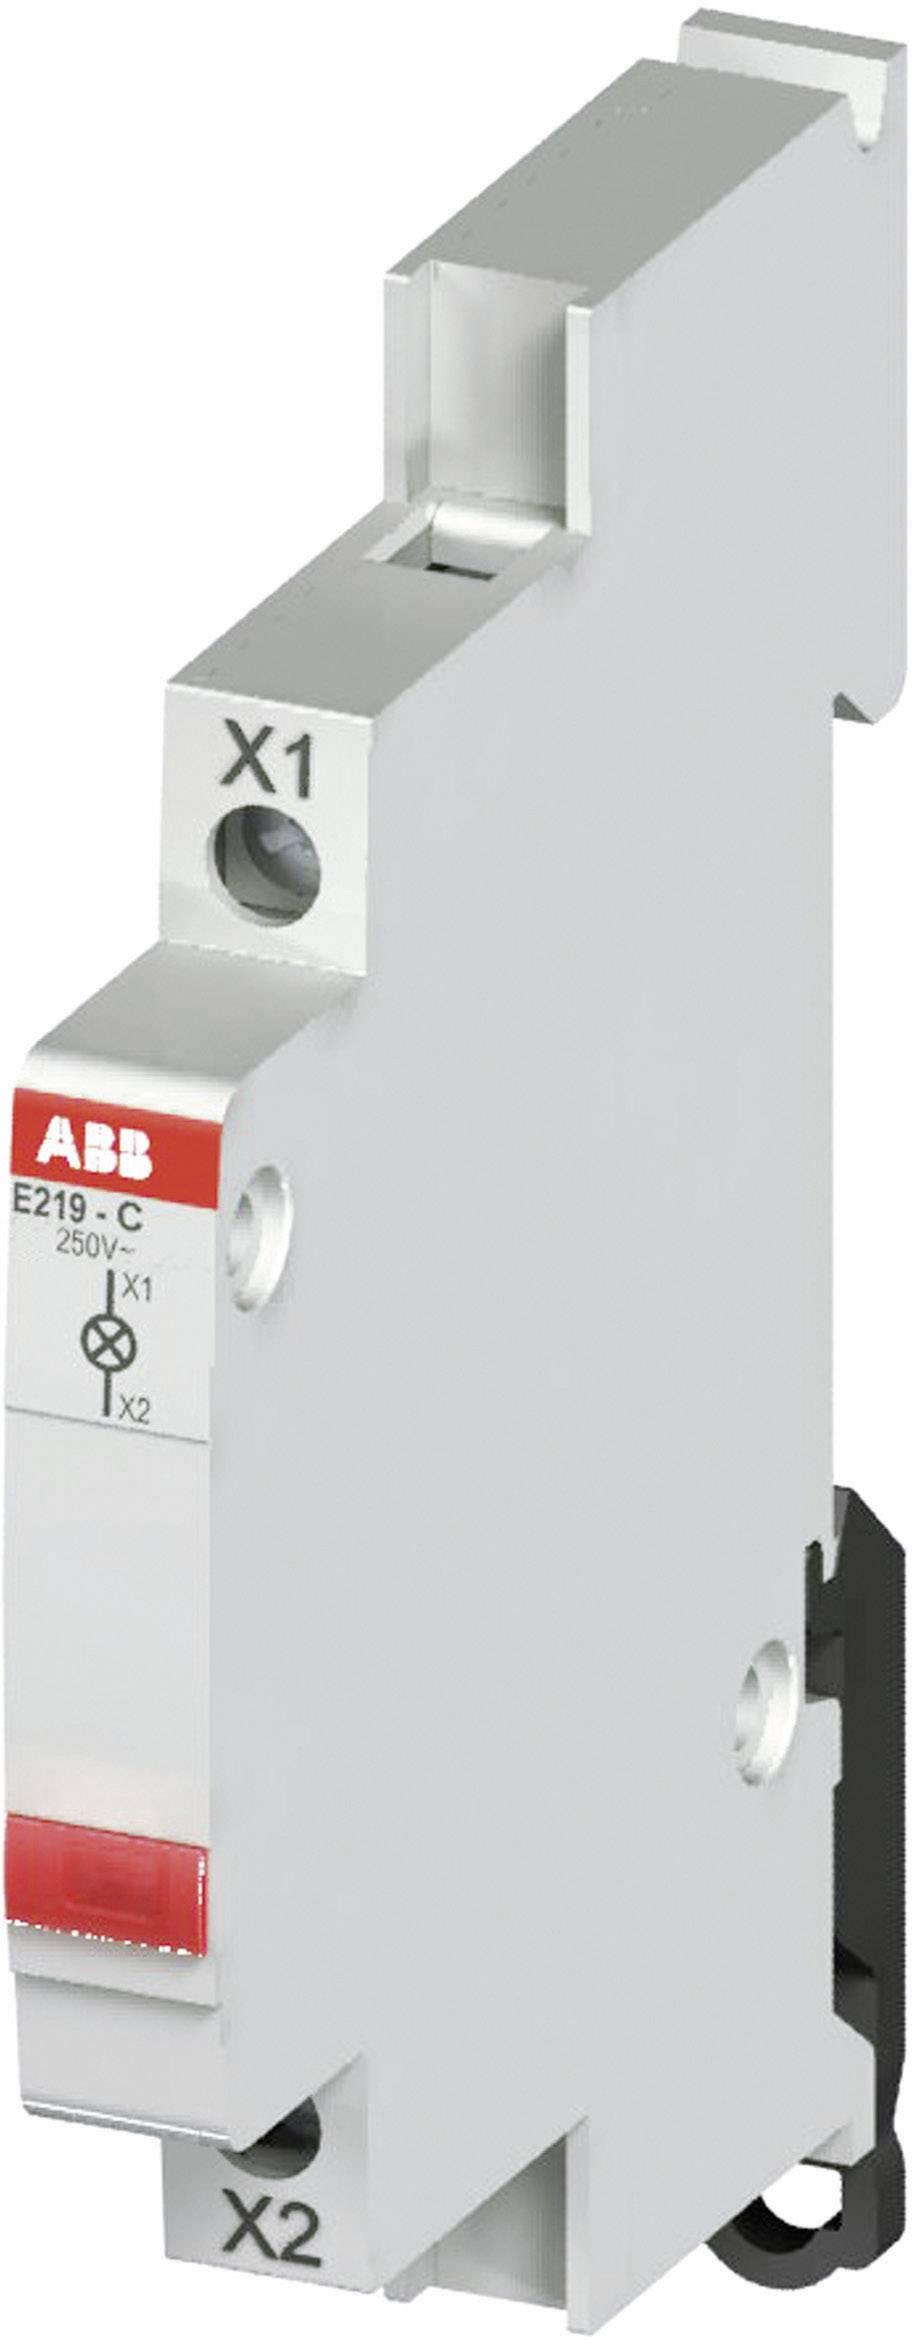 Kontrolka ABB na DIN lištu, 12/48 V, červená LED, 2CCA703421R0001